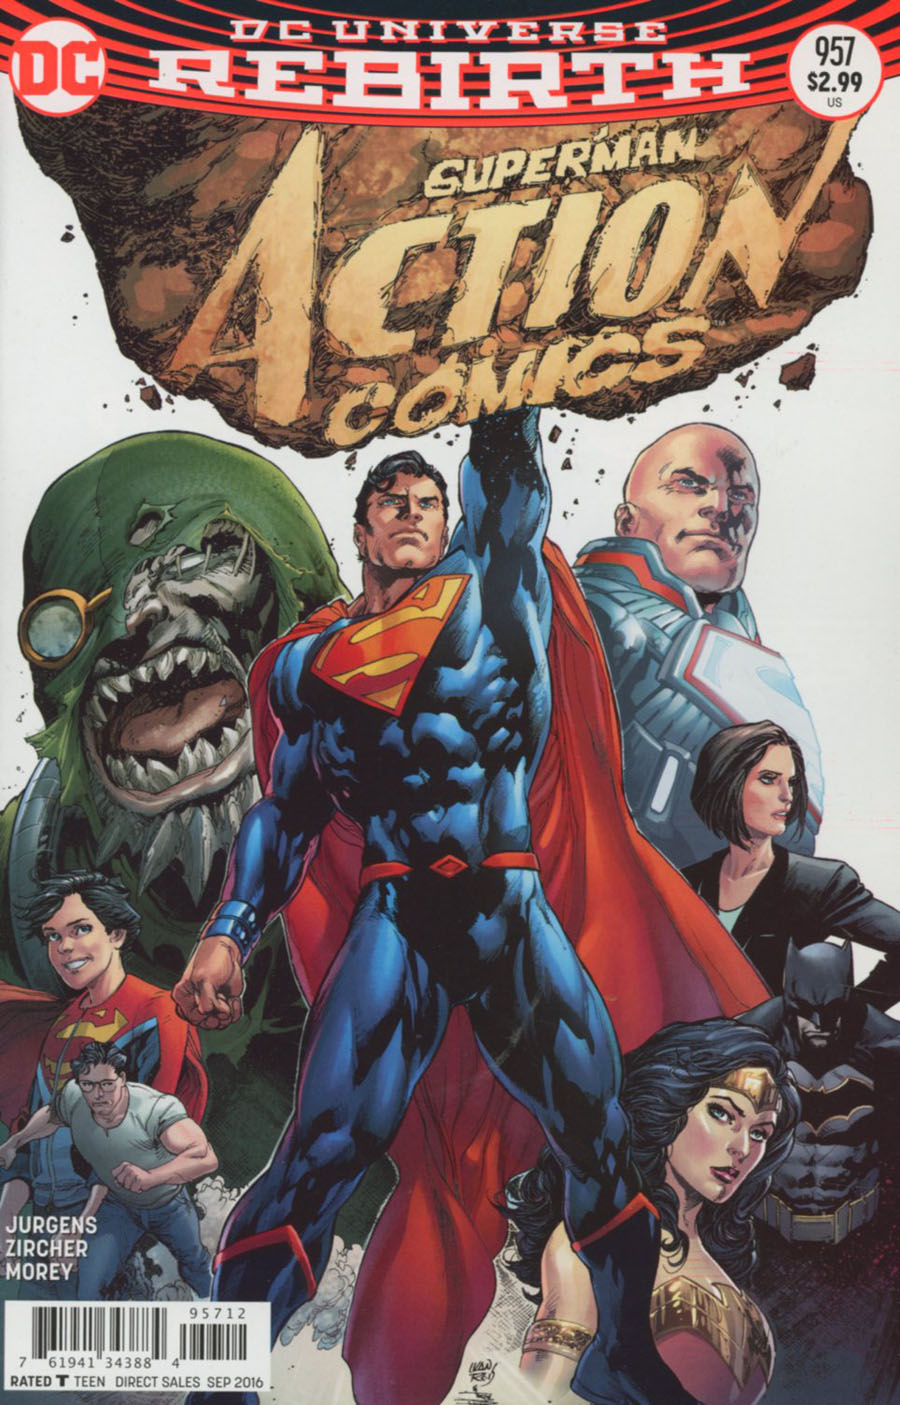 Action Comics Vol 2 #957 Cover D 2nd Ptg Ivan Reis Variant Cover